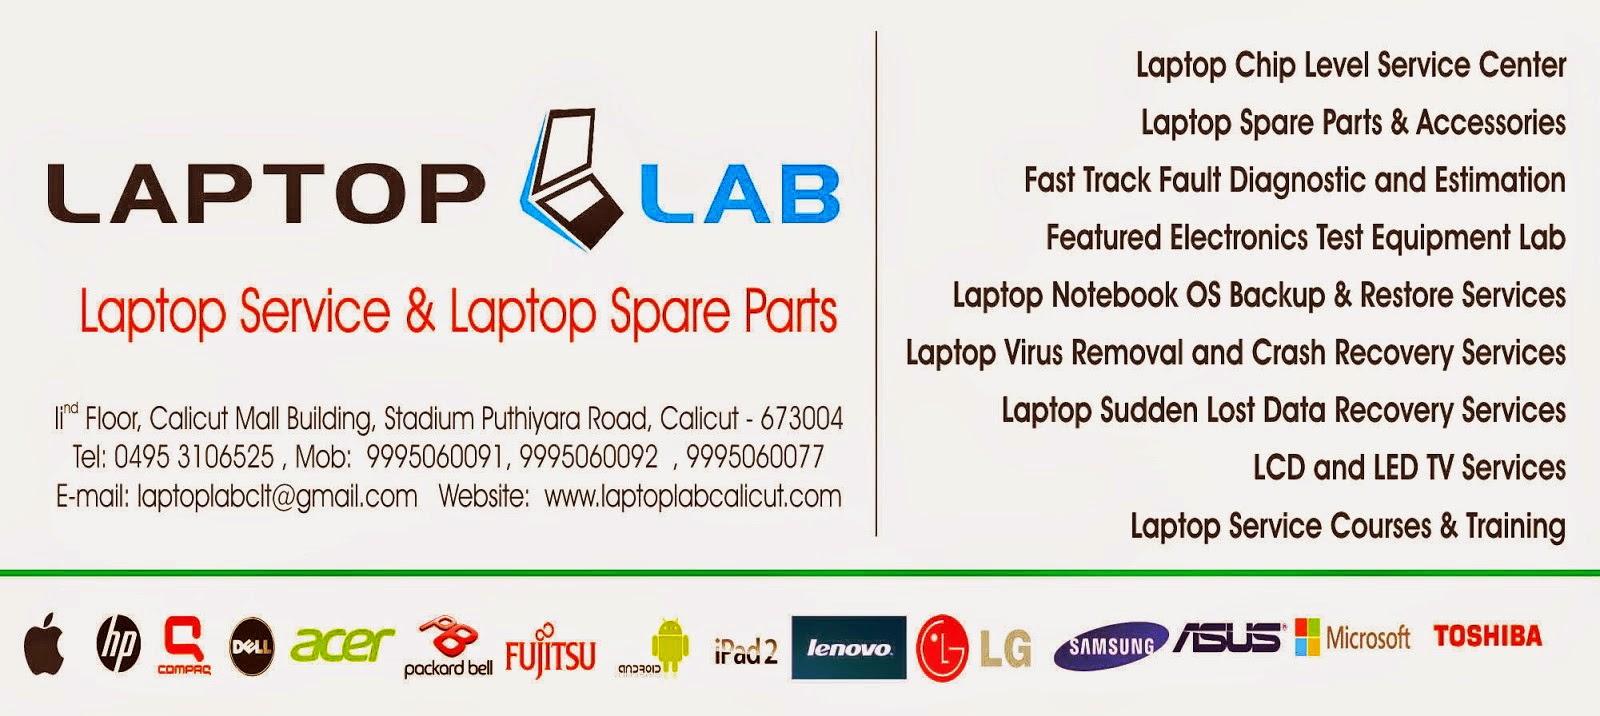 Laptop Macbook Service Center Calicut Kozhikode Bios Working Toshiba G7 Wiring Diagram Laptoplab Blog Http Laptoplabsparesblogspotcom